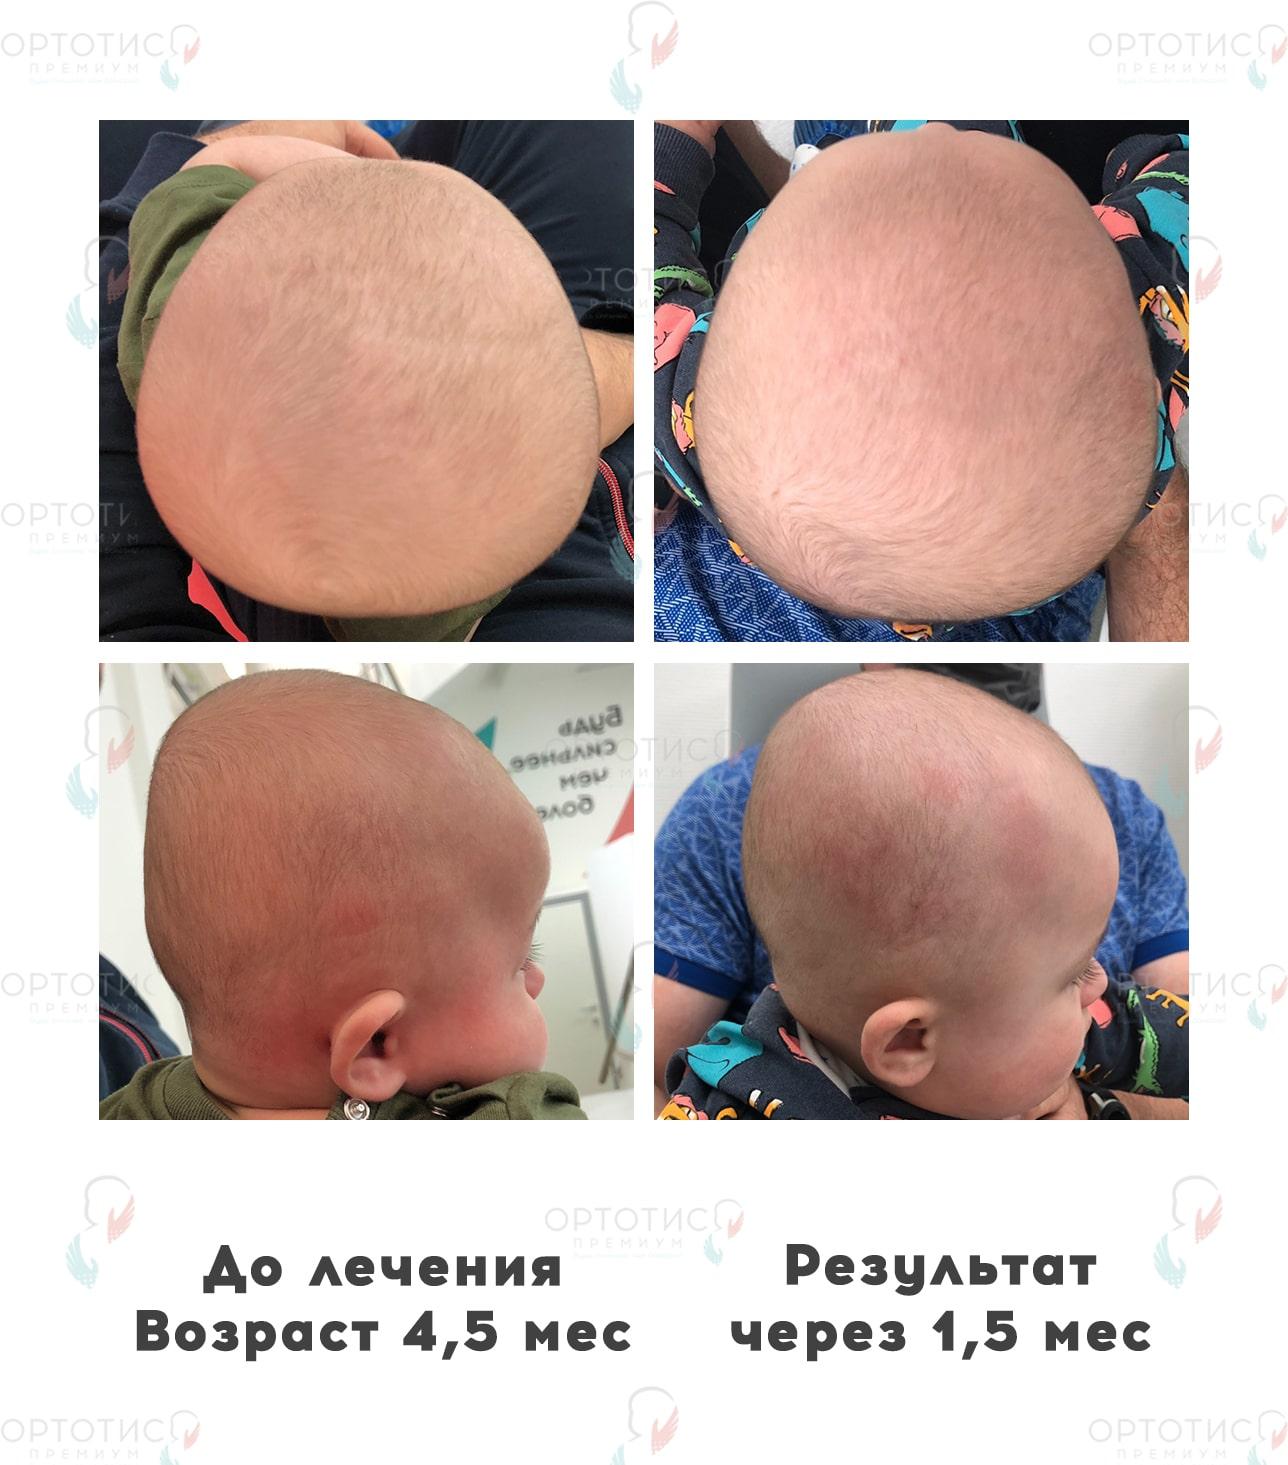 Брахицефалия, 4 месяцев - Ортотис Премиум